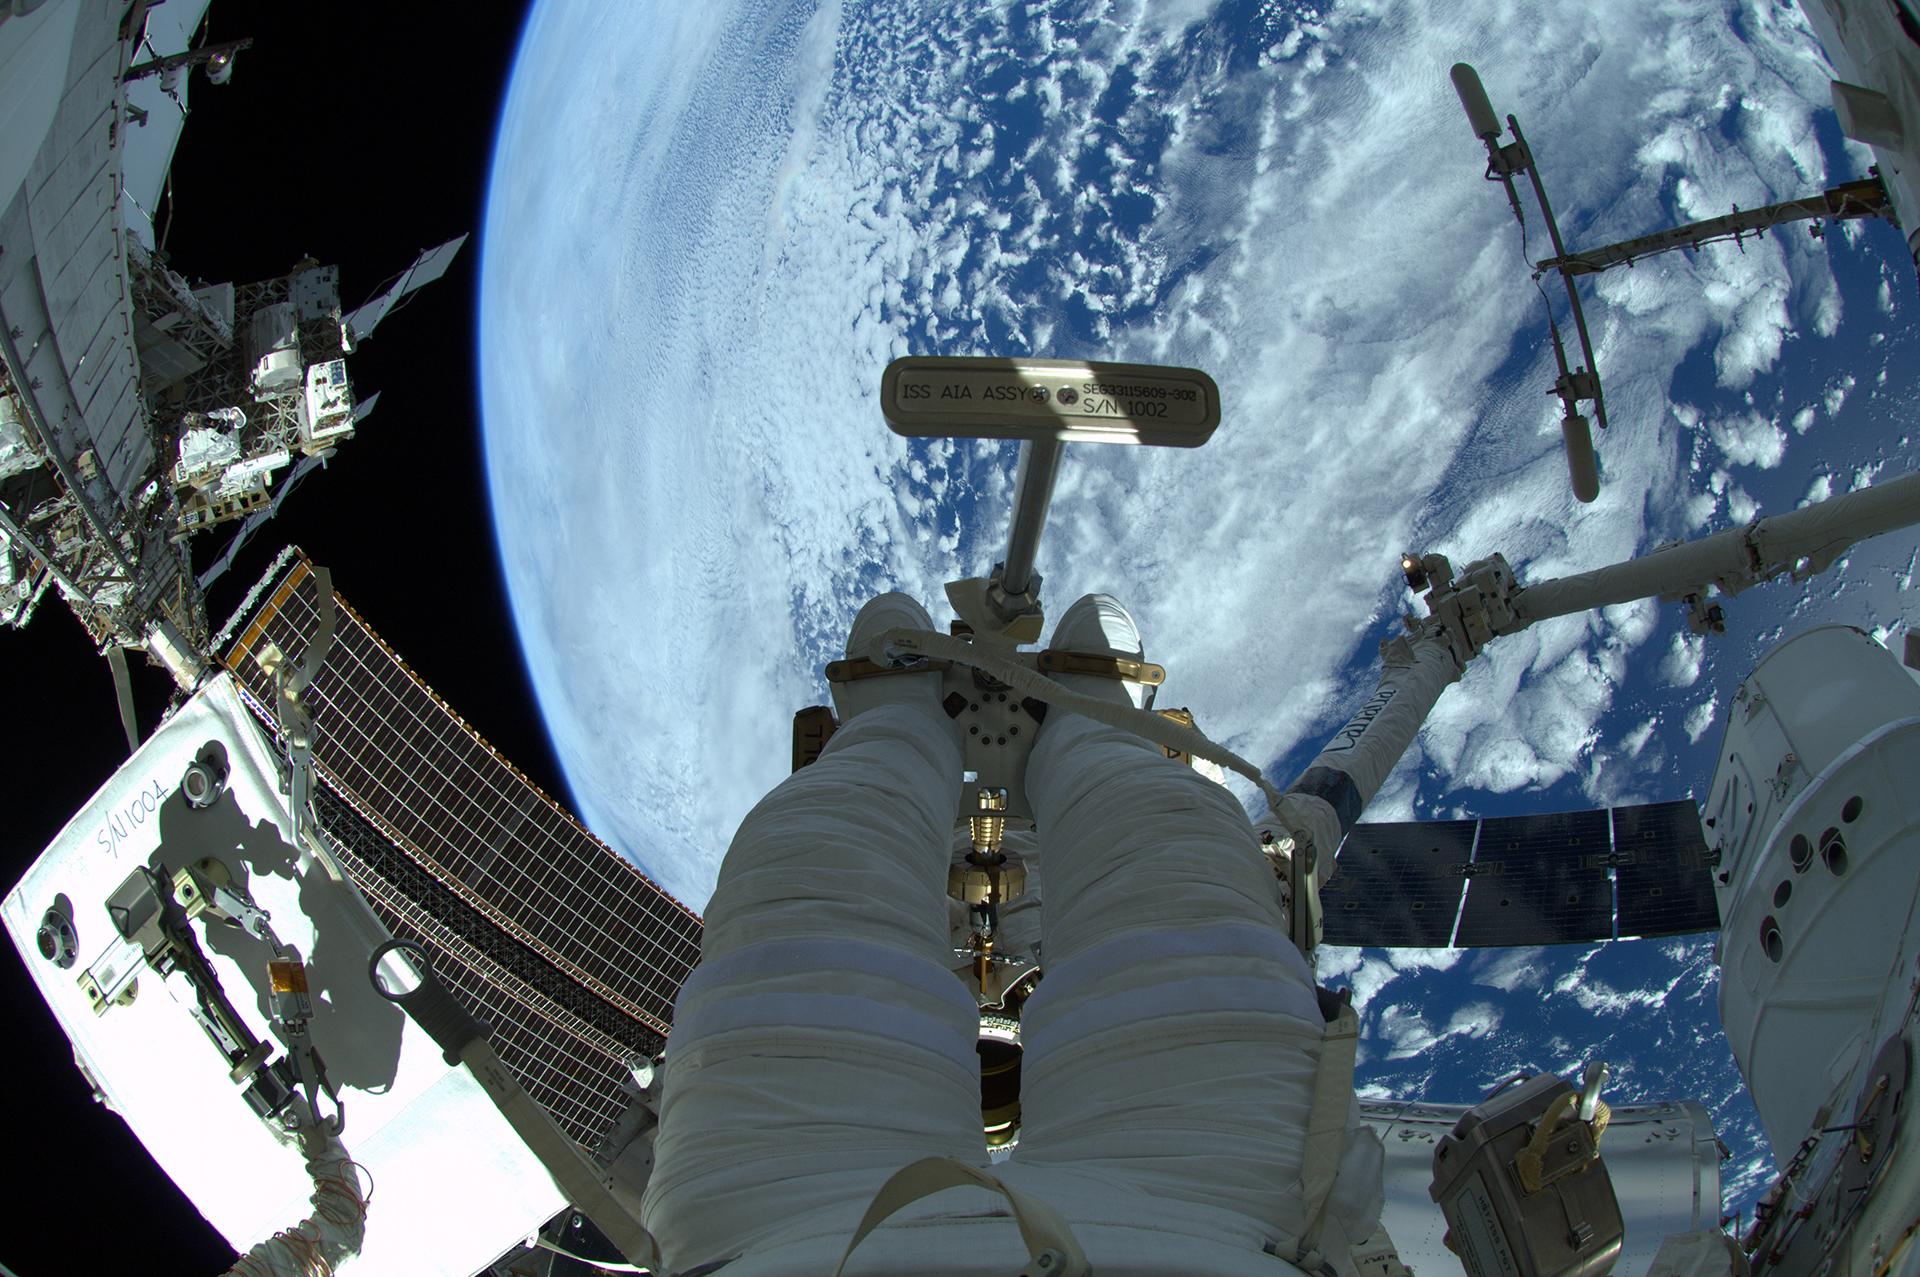 a 70 kg astronaut in space walking outside - photo #20